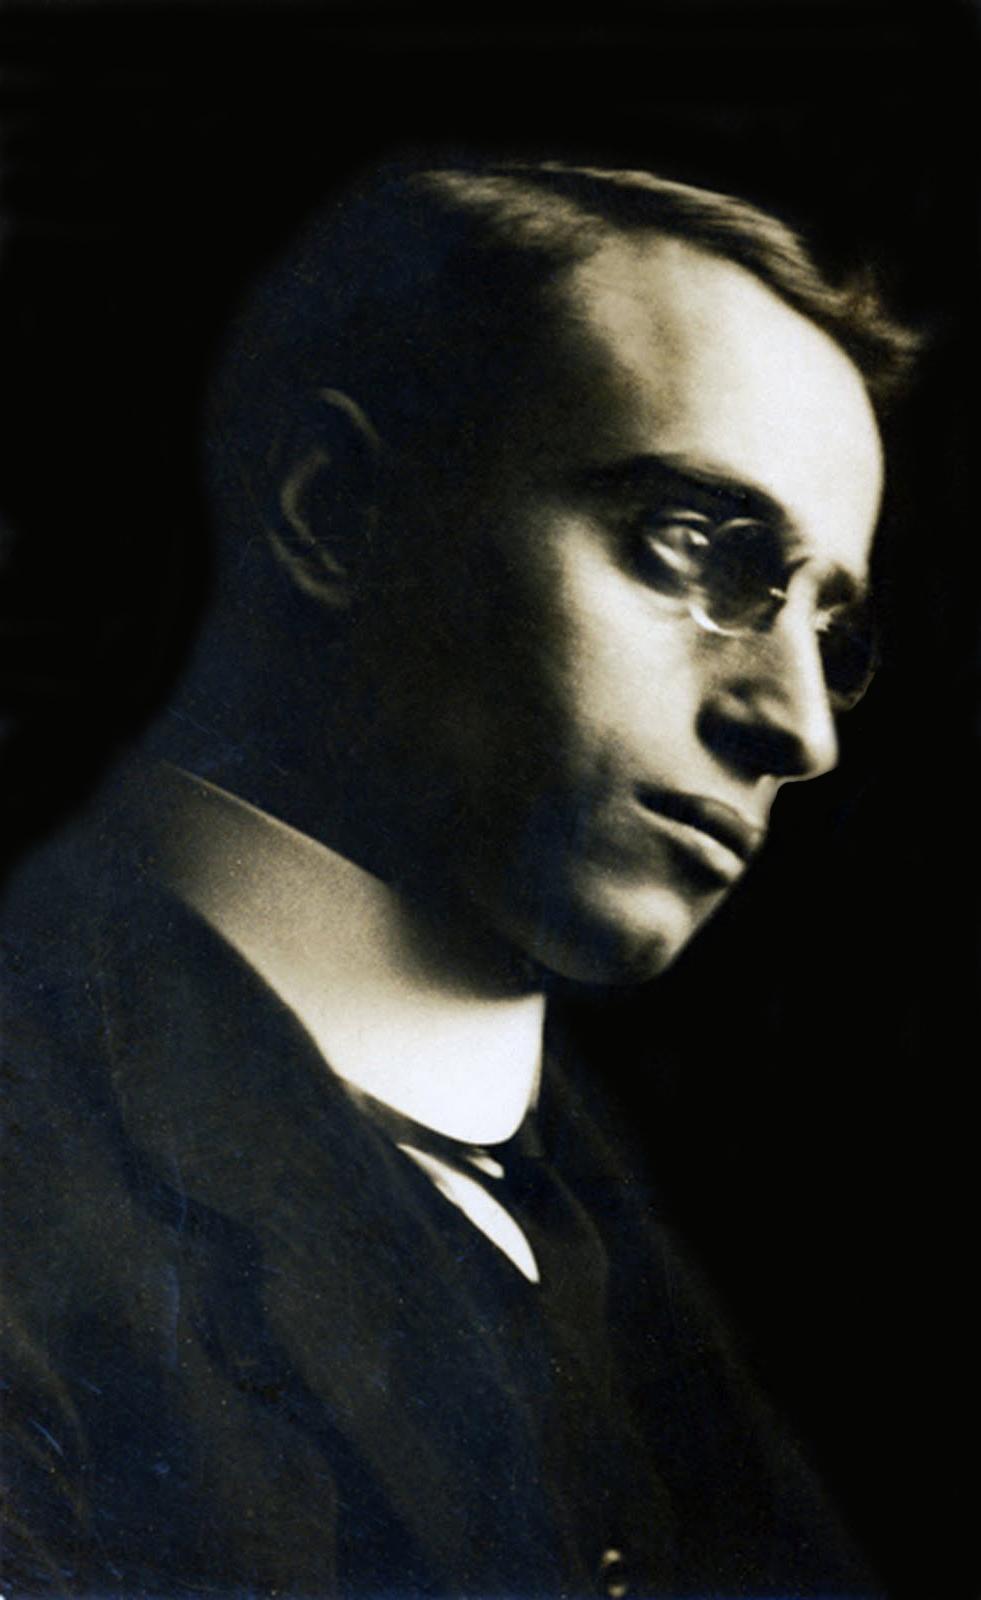 Leo Frank image